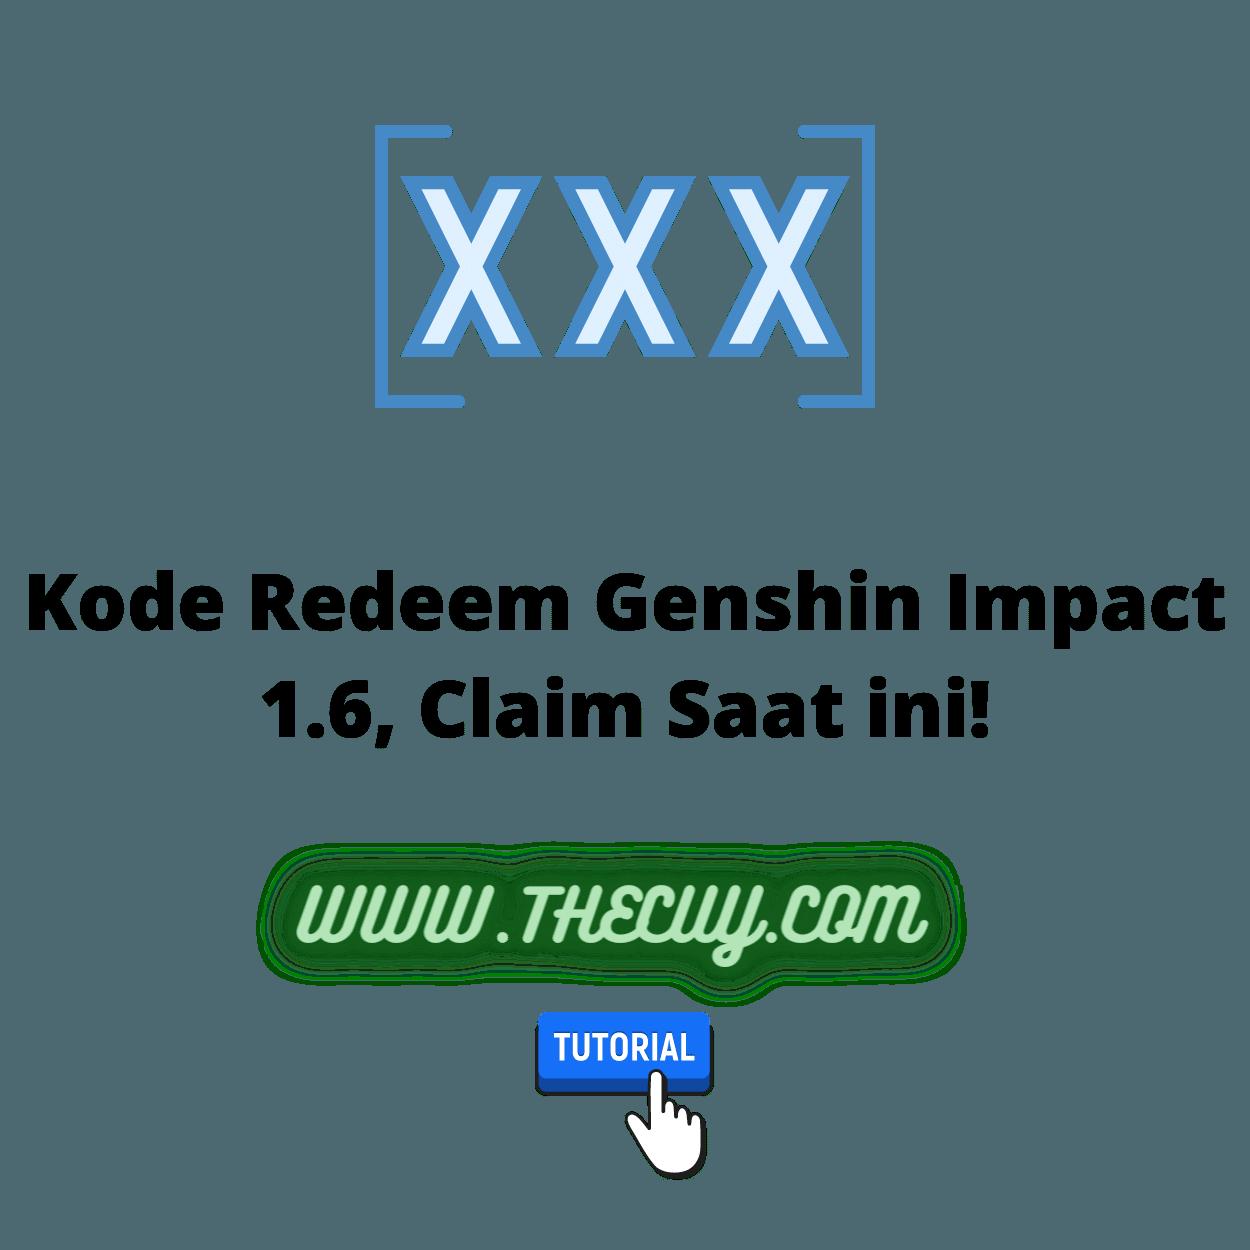 Kode Redeem Genshin Impact 1.6, Claim Saatini!